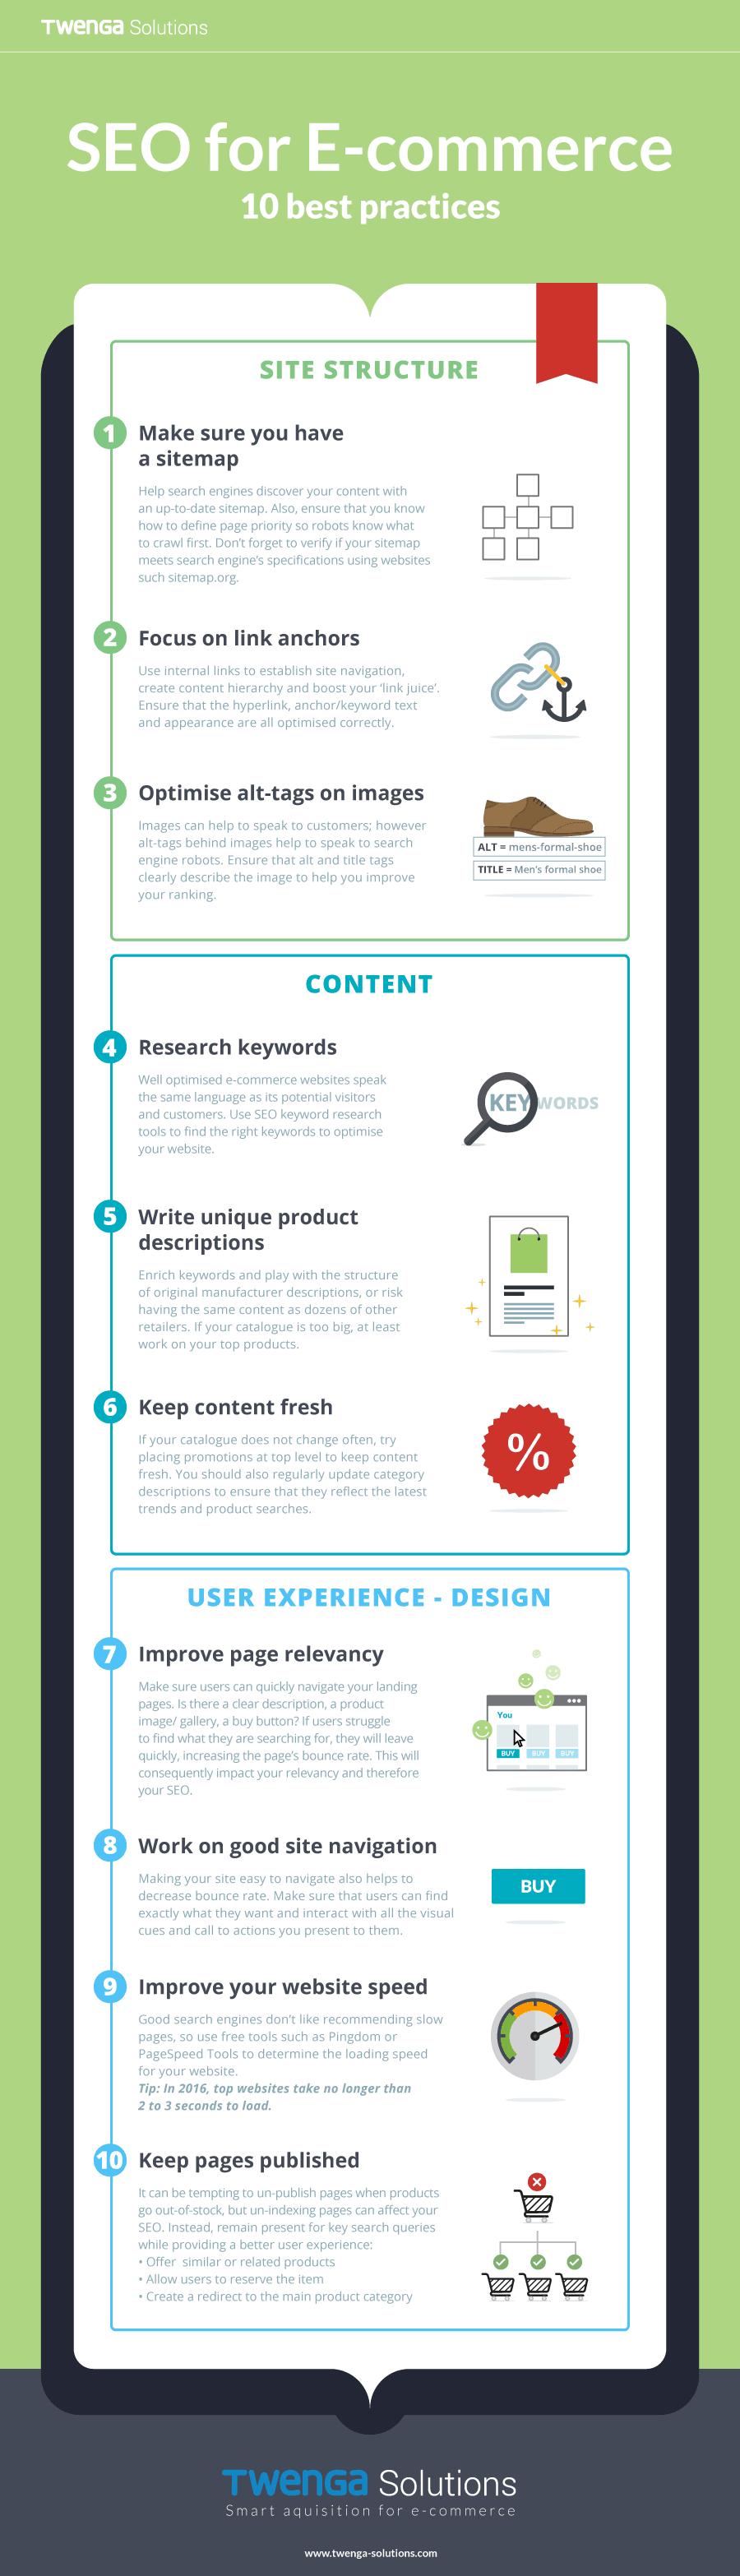 guia seo para ecommerce infografia